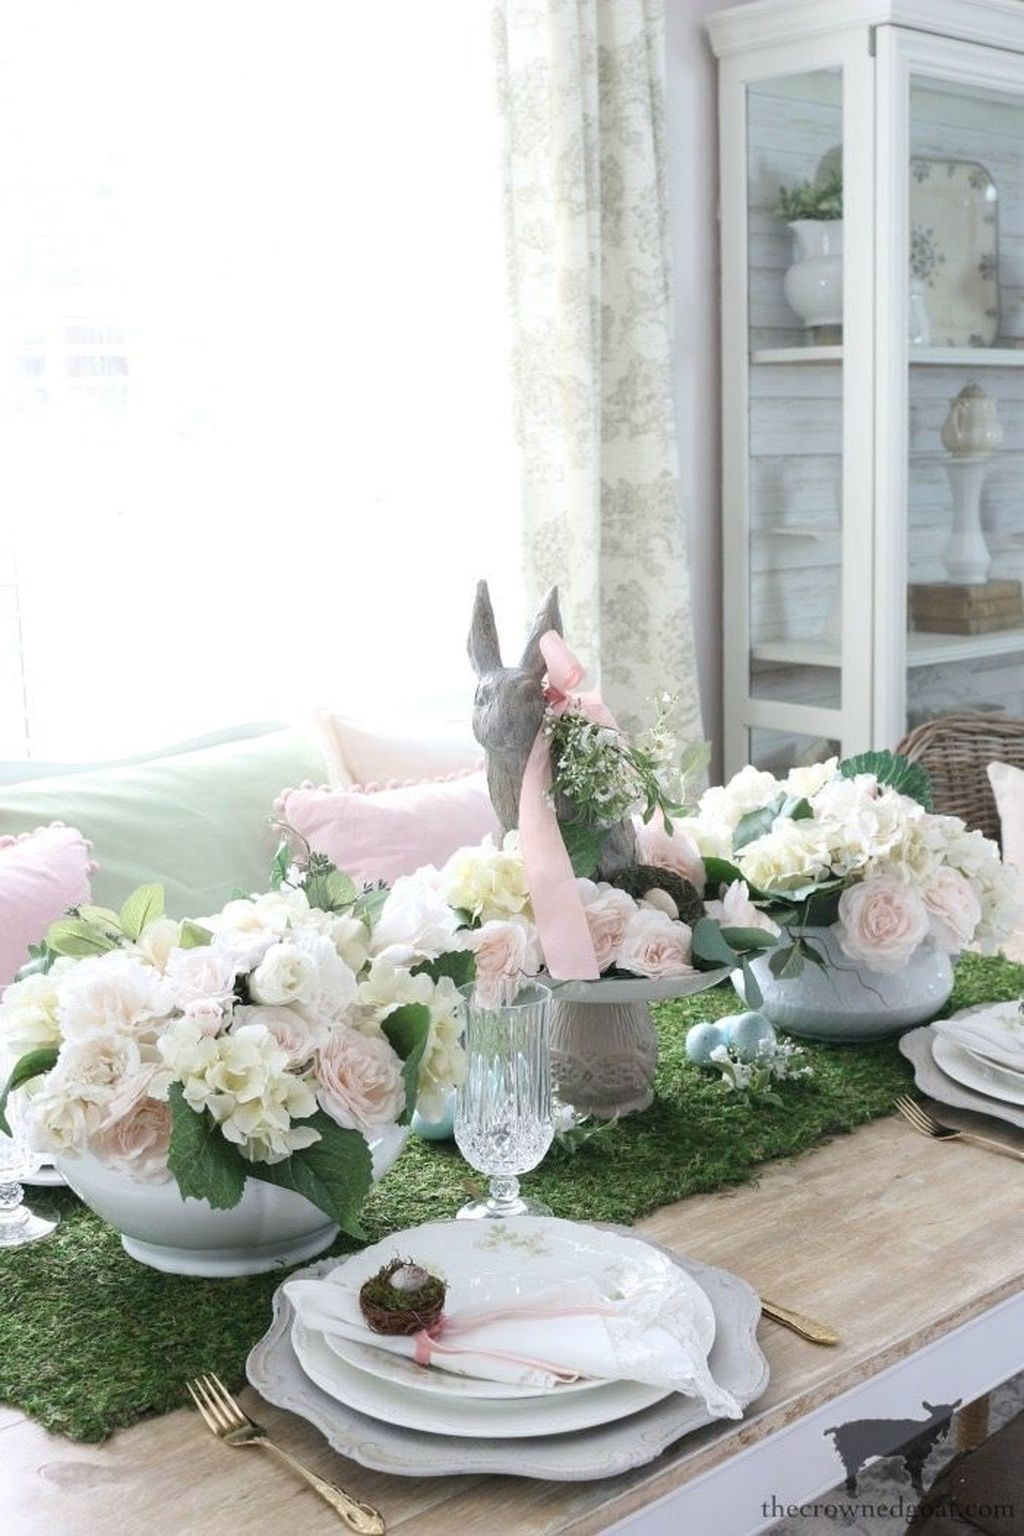 The Best Farmhouse Style Spring Tablescape Decor Ideas 25